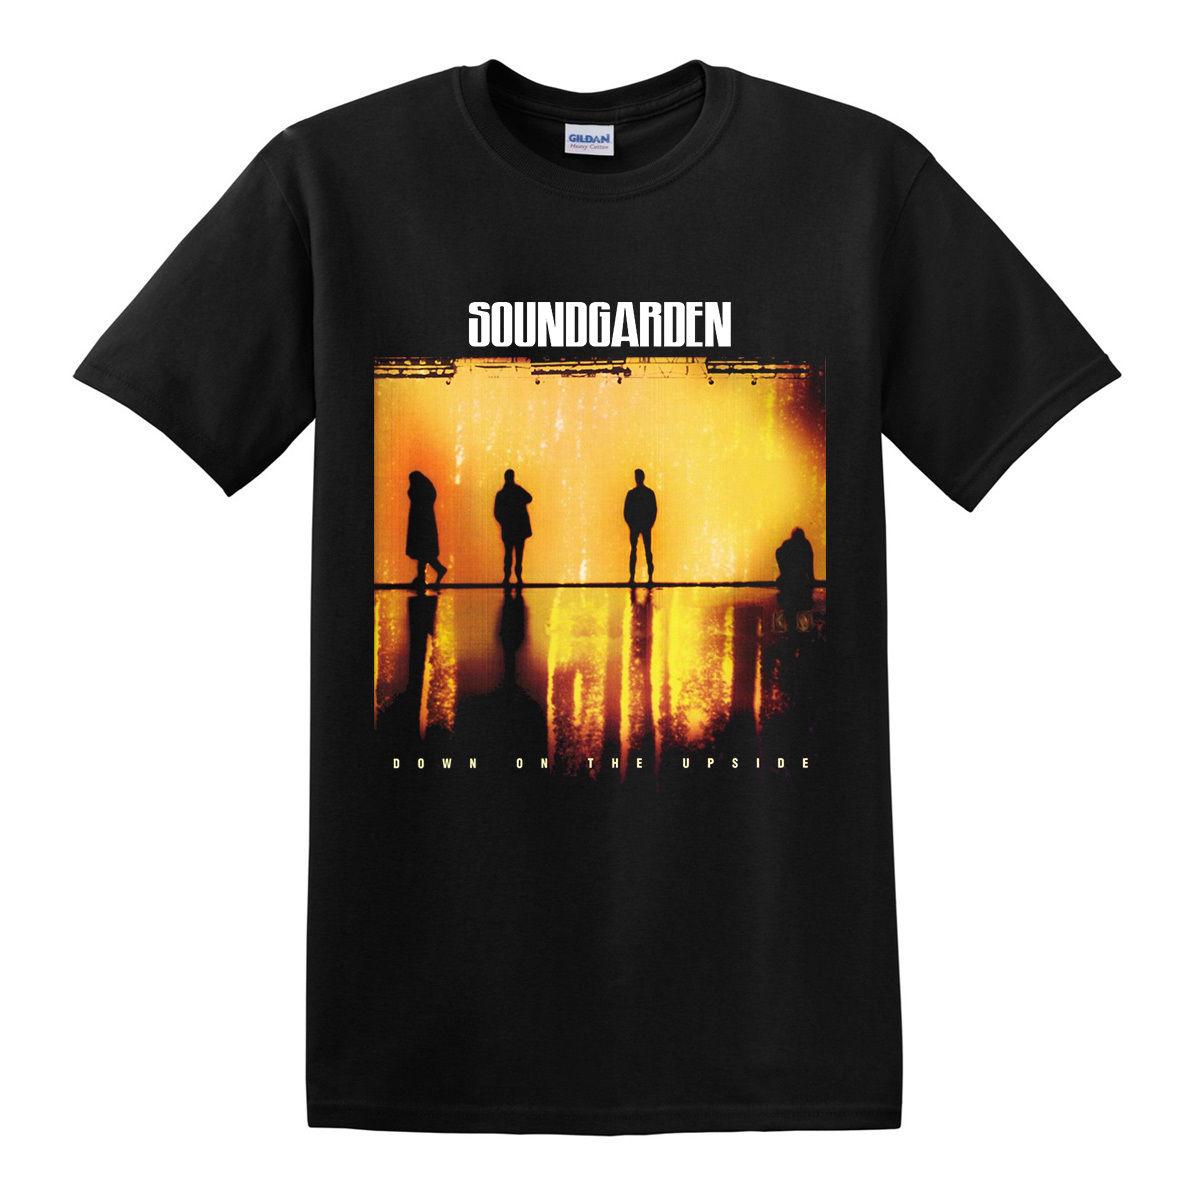 Black t shirt grunge - Aliexpress Com Buy Soundgarden Down On The Upside 1996 T Shirt Grunge Alternative Rock Black Design Short Sleeve T Shirt Top Tees From Reliable Short